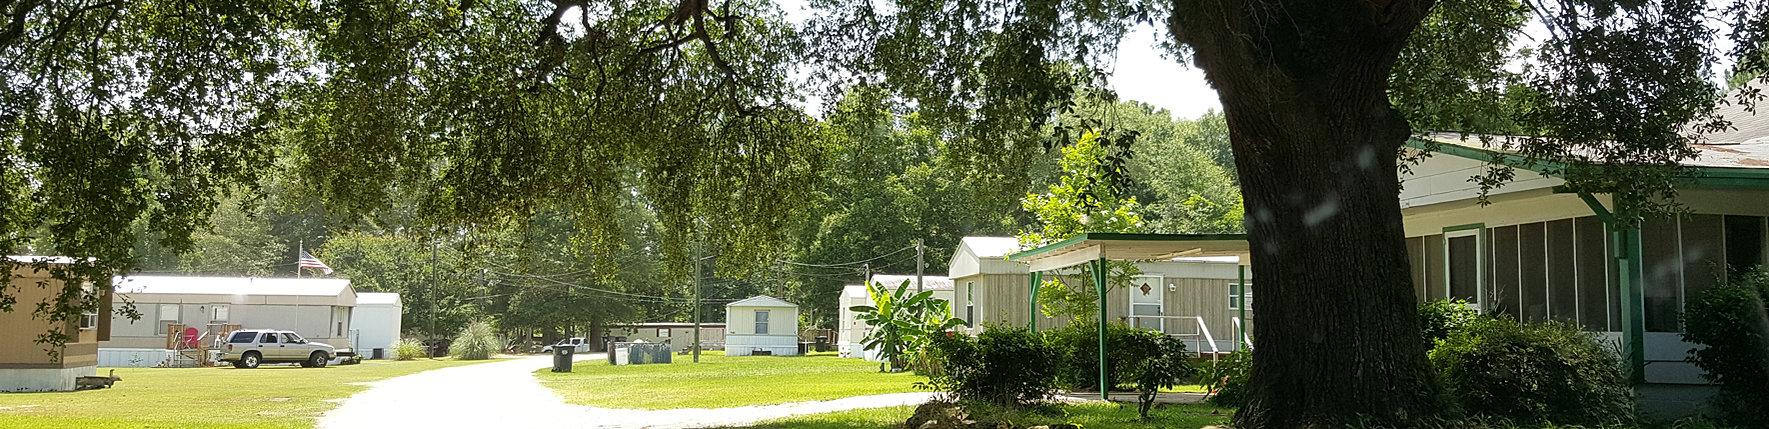 The Mobile Home Park Broker